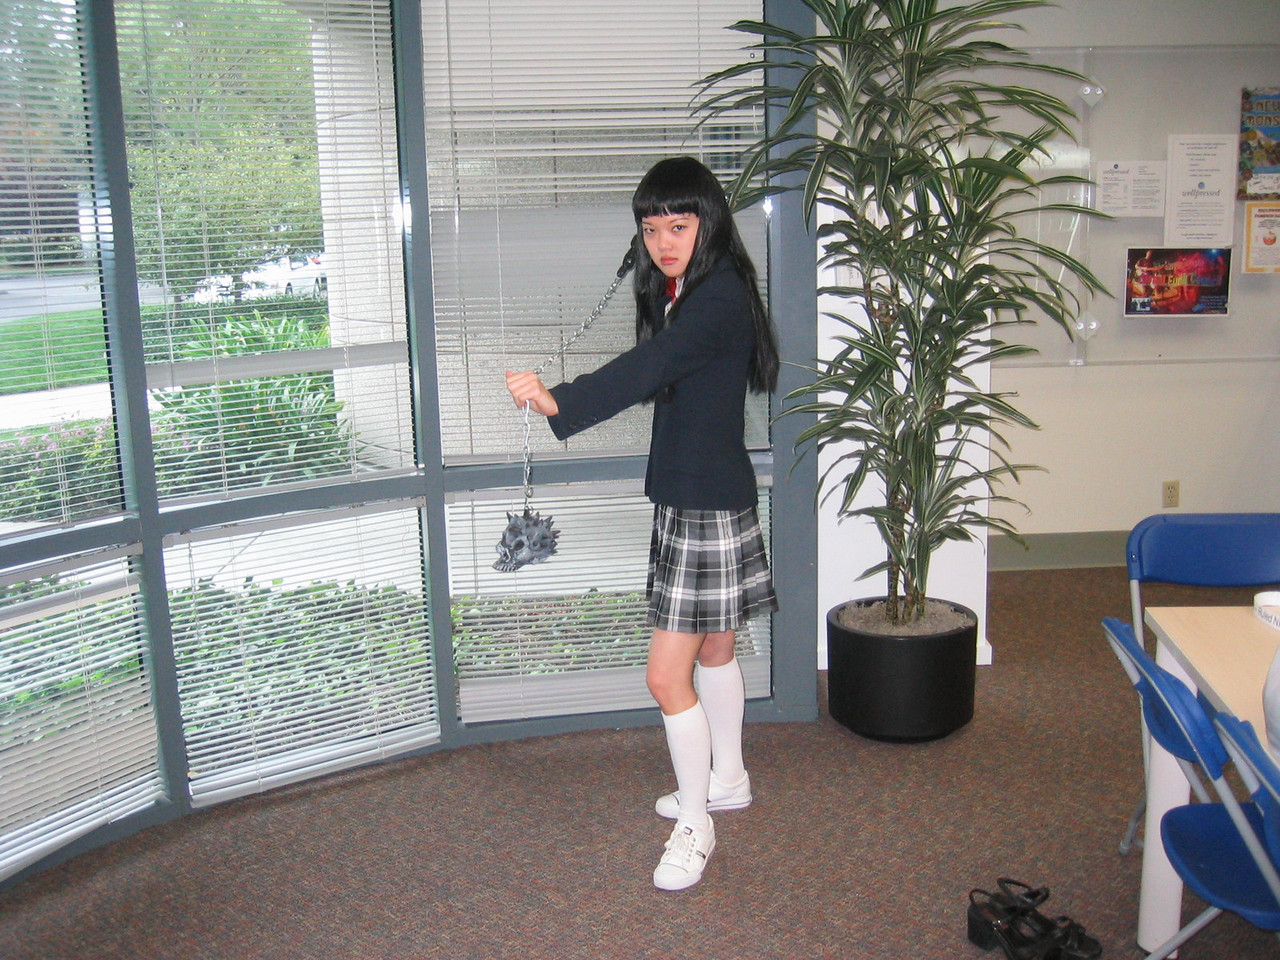 2004 10 29 Friday - Joann Chu as the Kill Bill girl 2